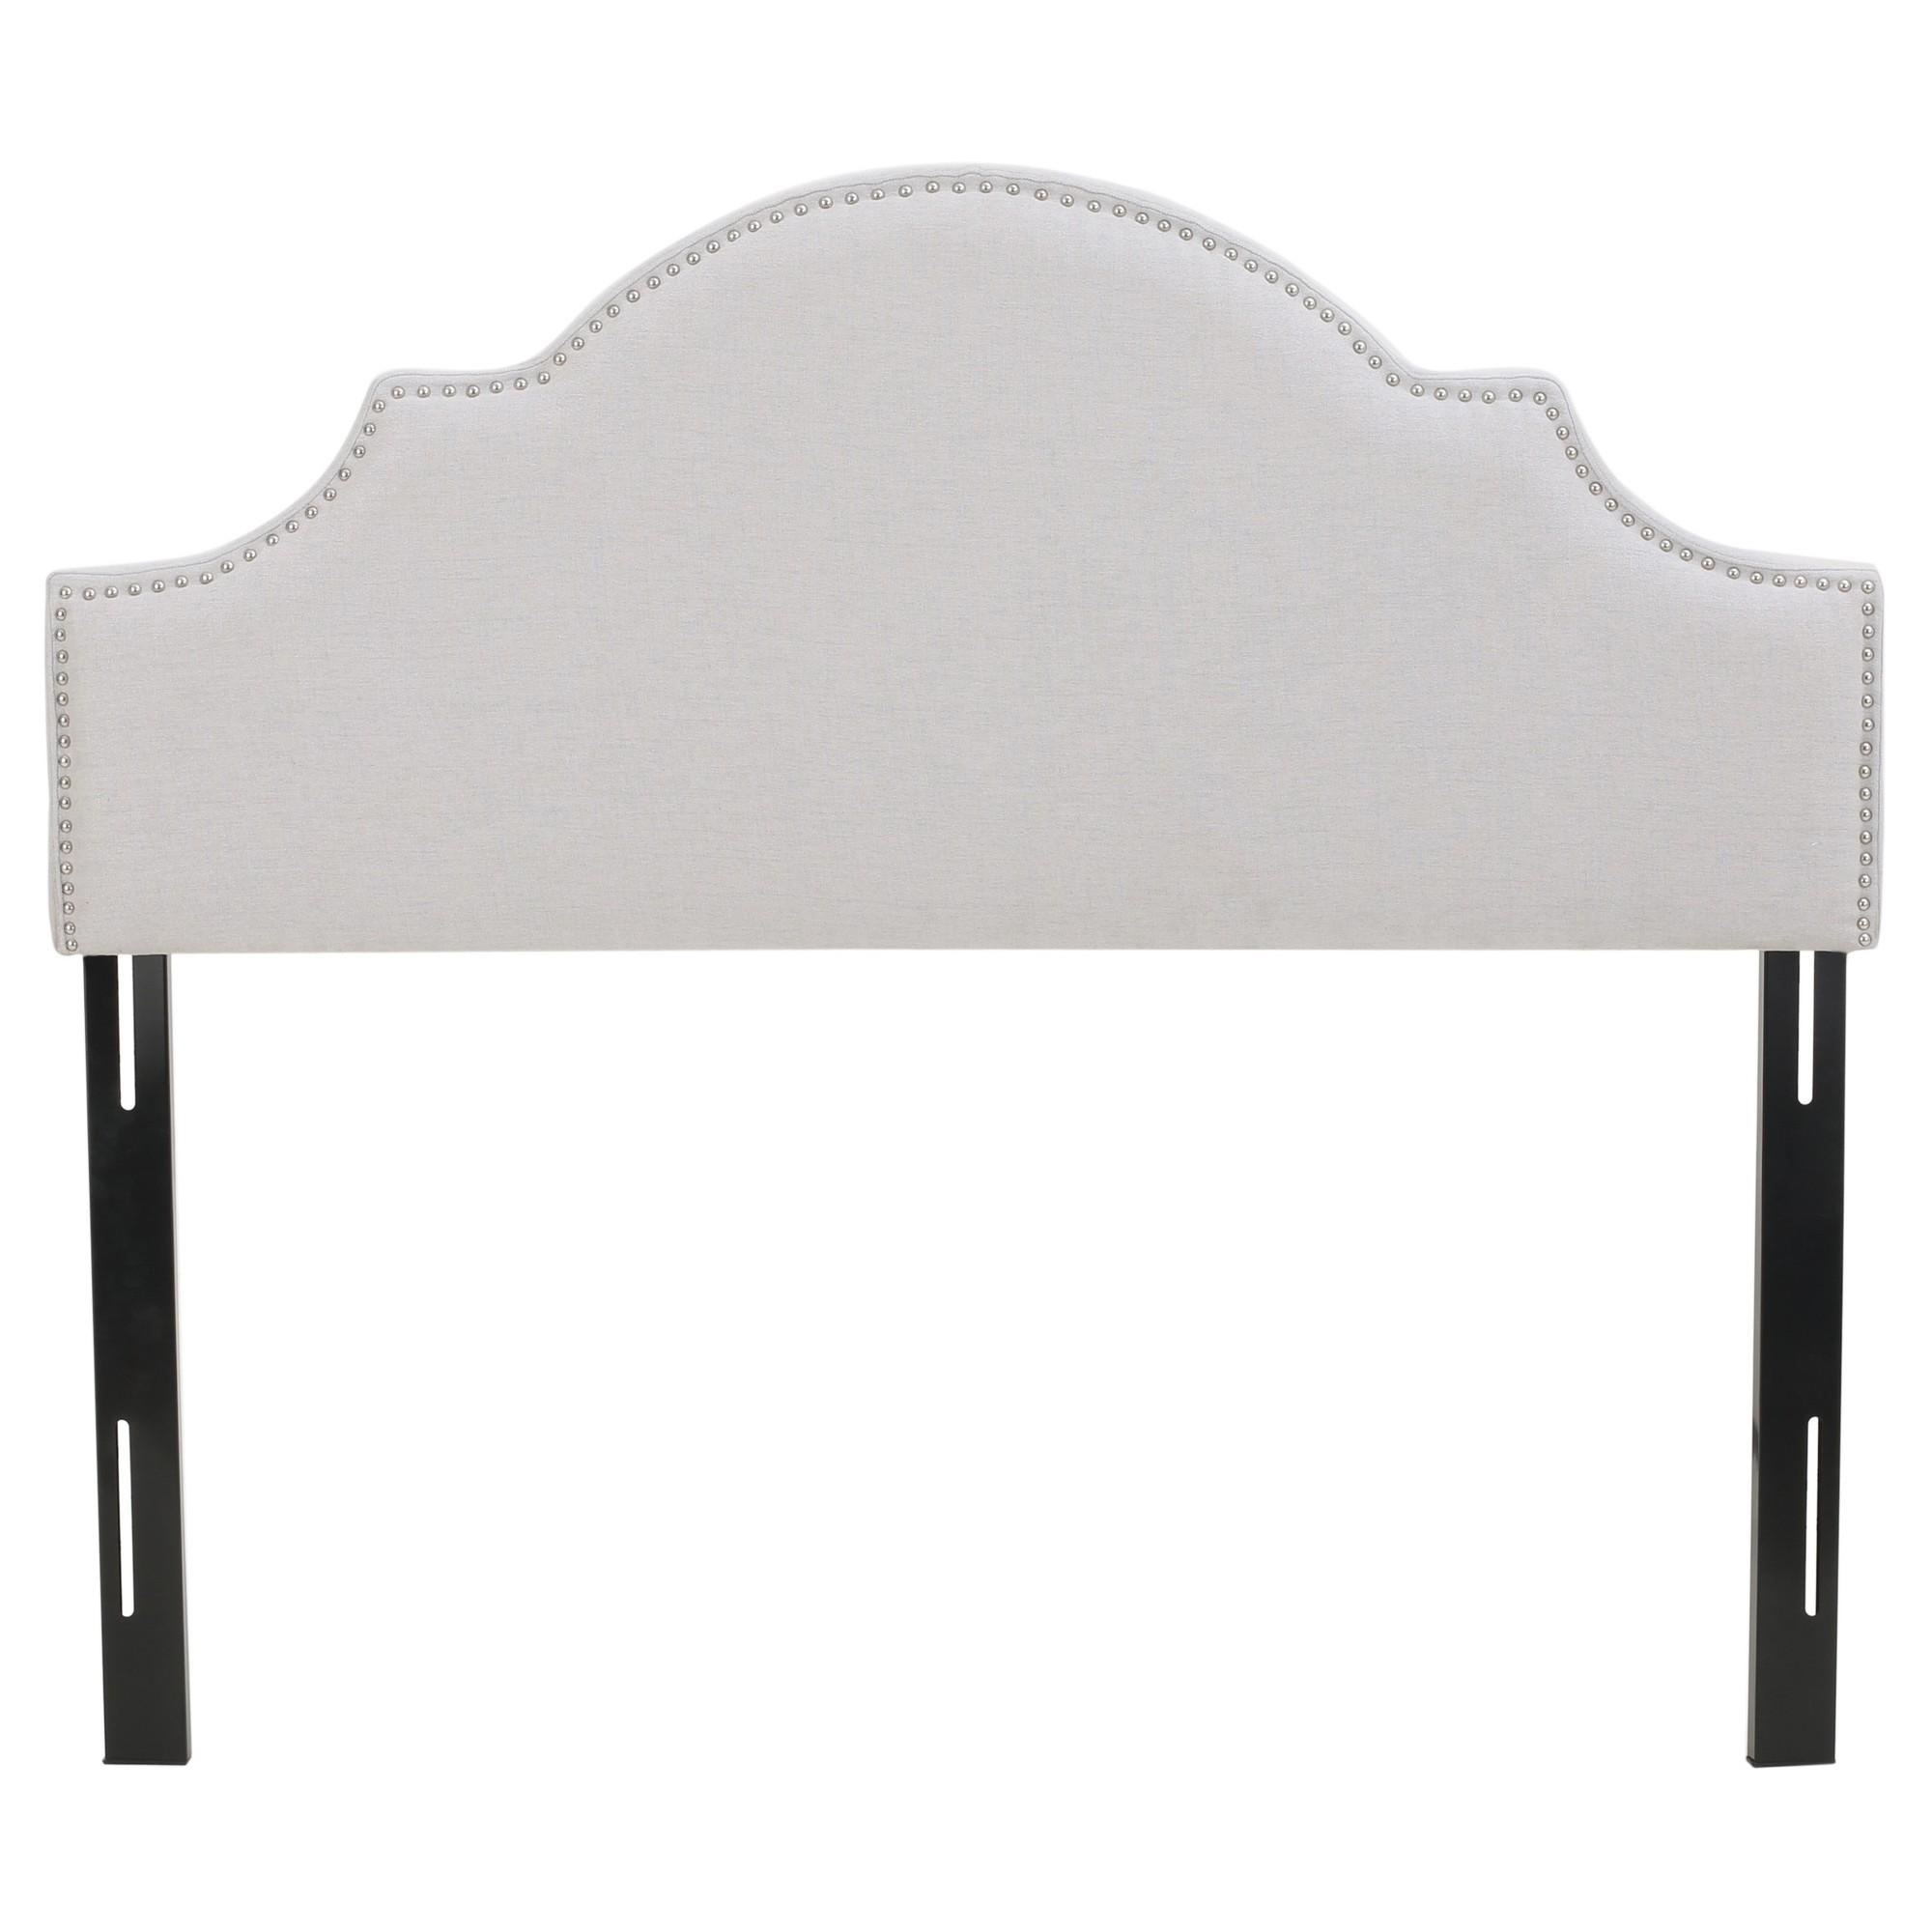 Best Nora Upholstered Headboard Full Queen Light Gray 400 x 300